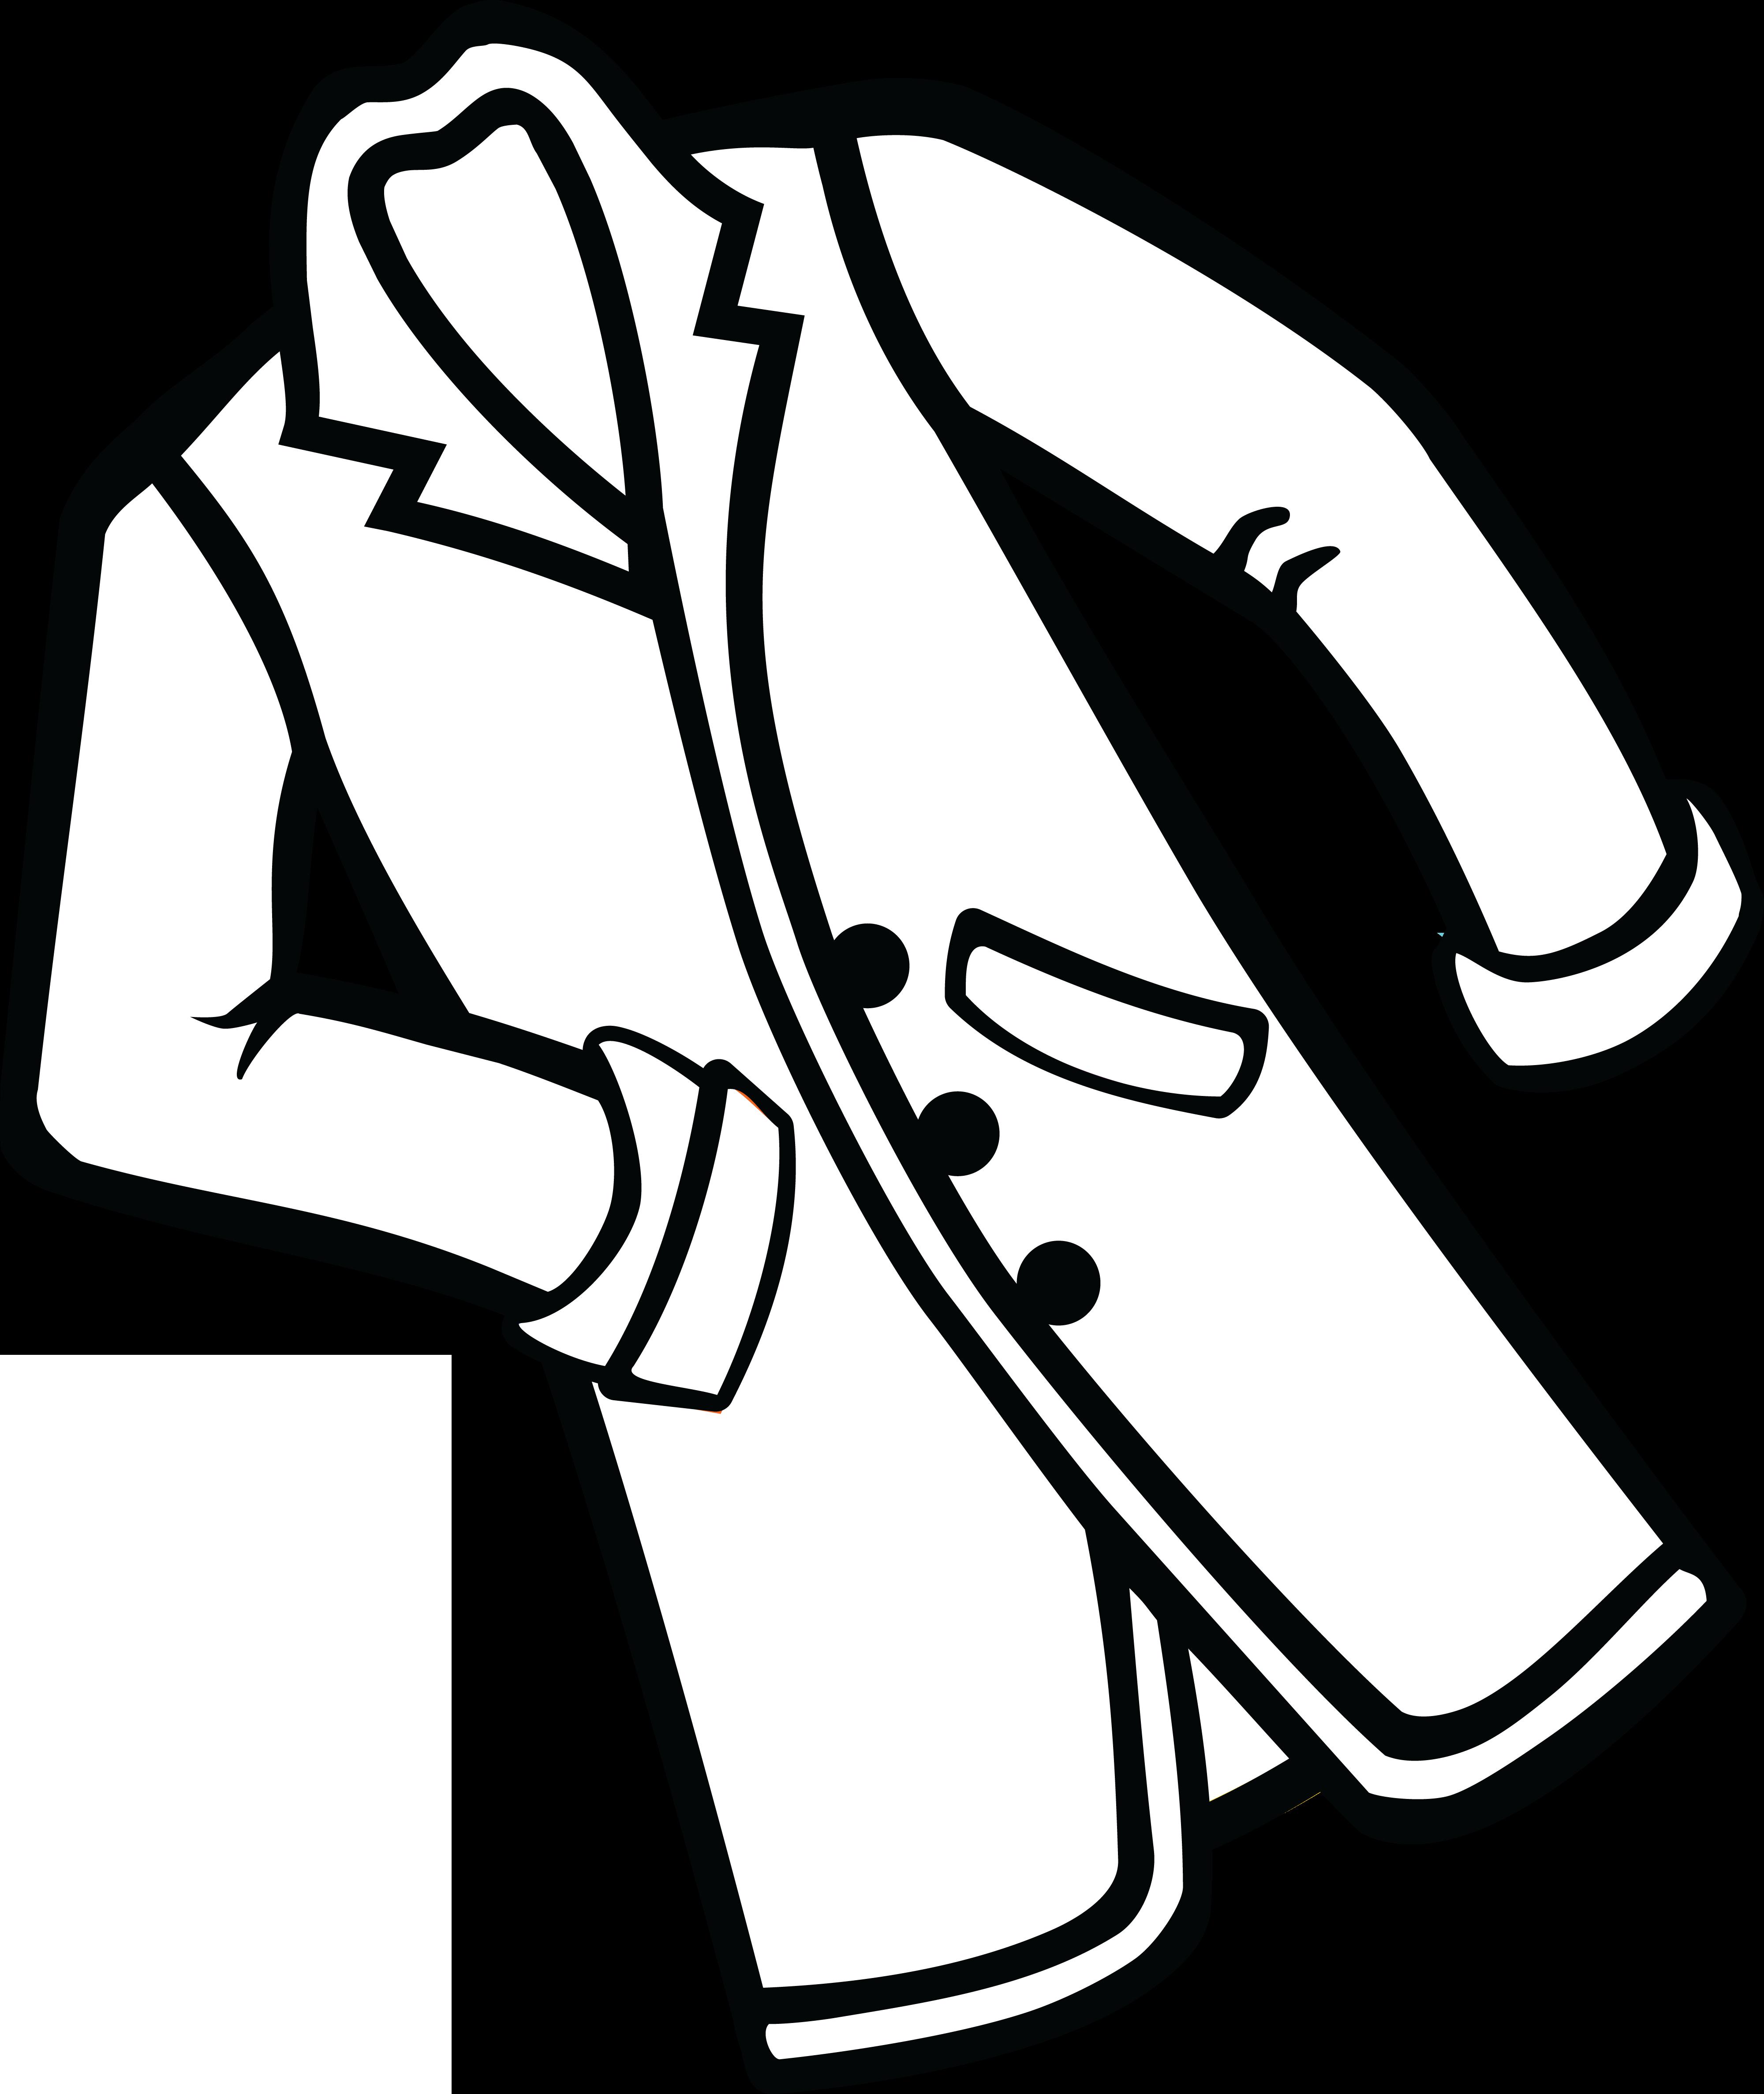 Jacket clipart black and white banner freeuse Clipart doctor white coat, Clipart doctor white coat Transparent ... banner freeuse